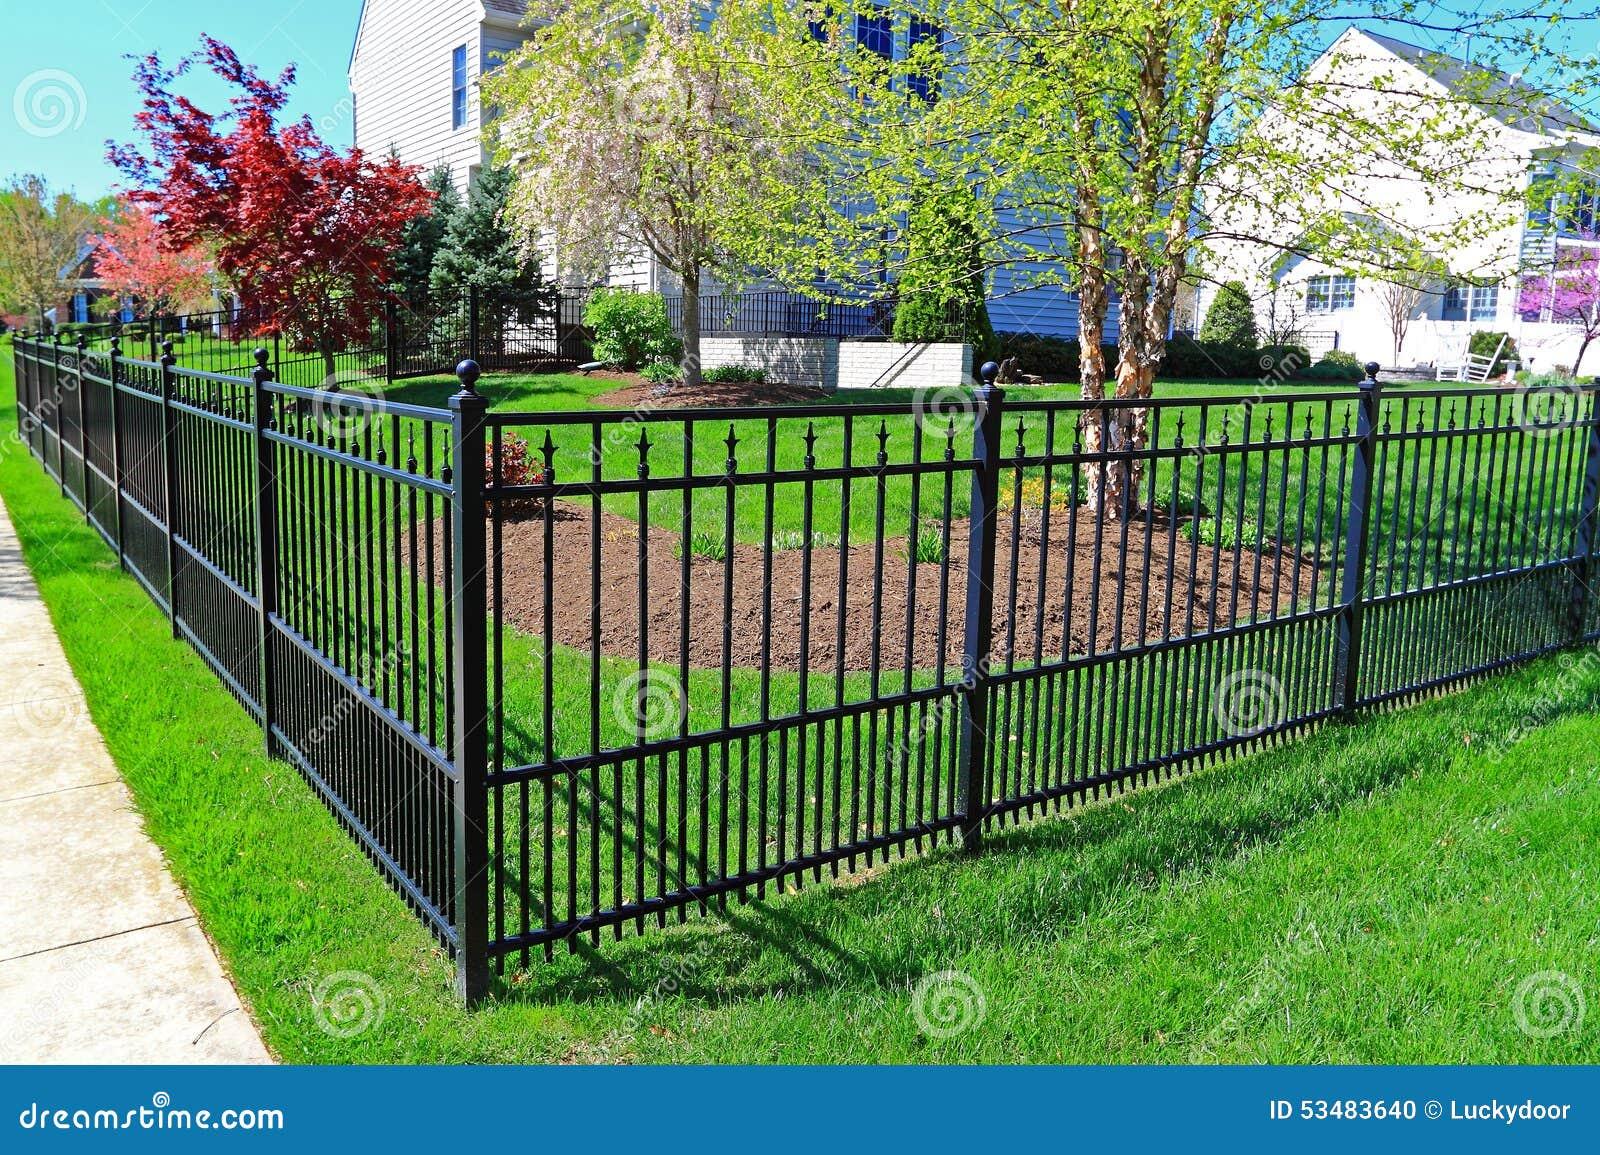 Vinyl Privacy Fences Cost